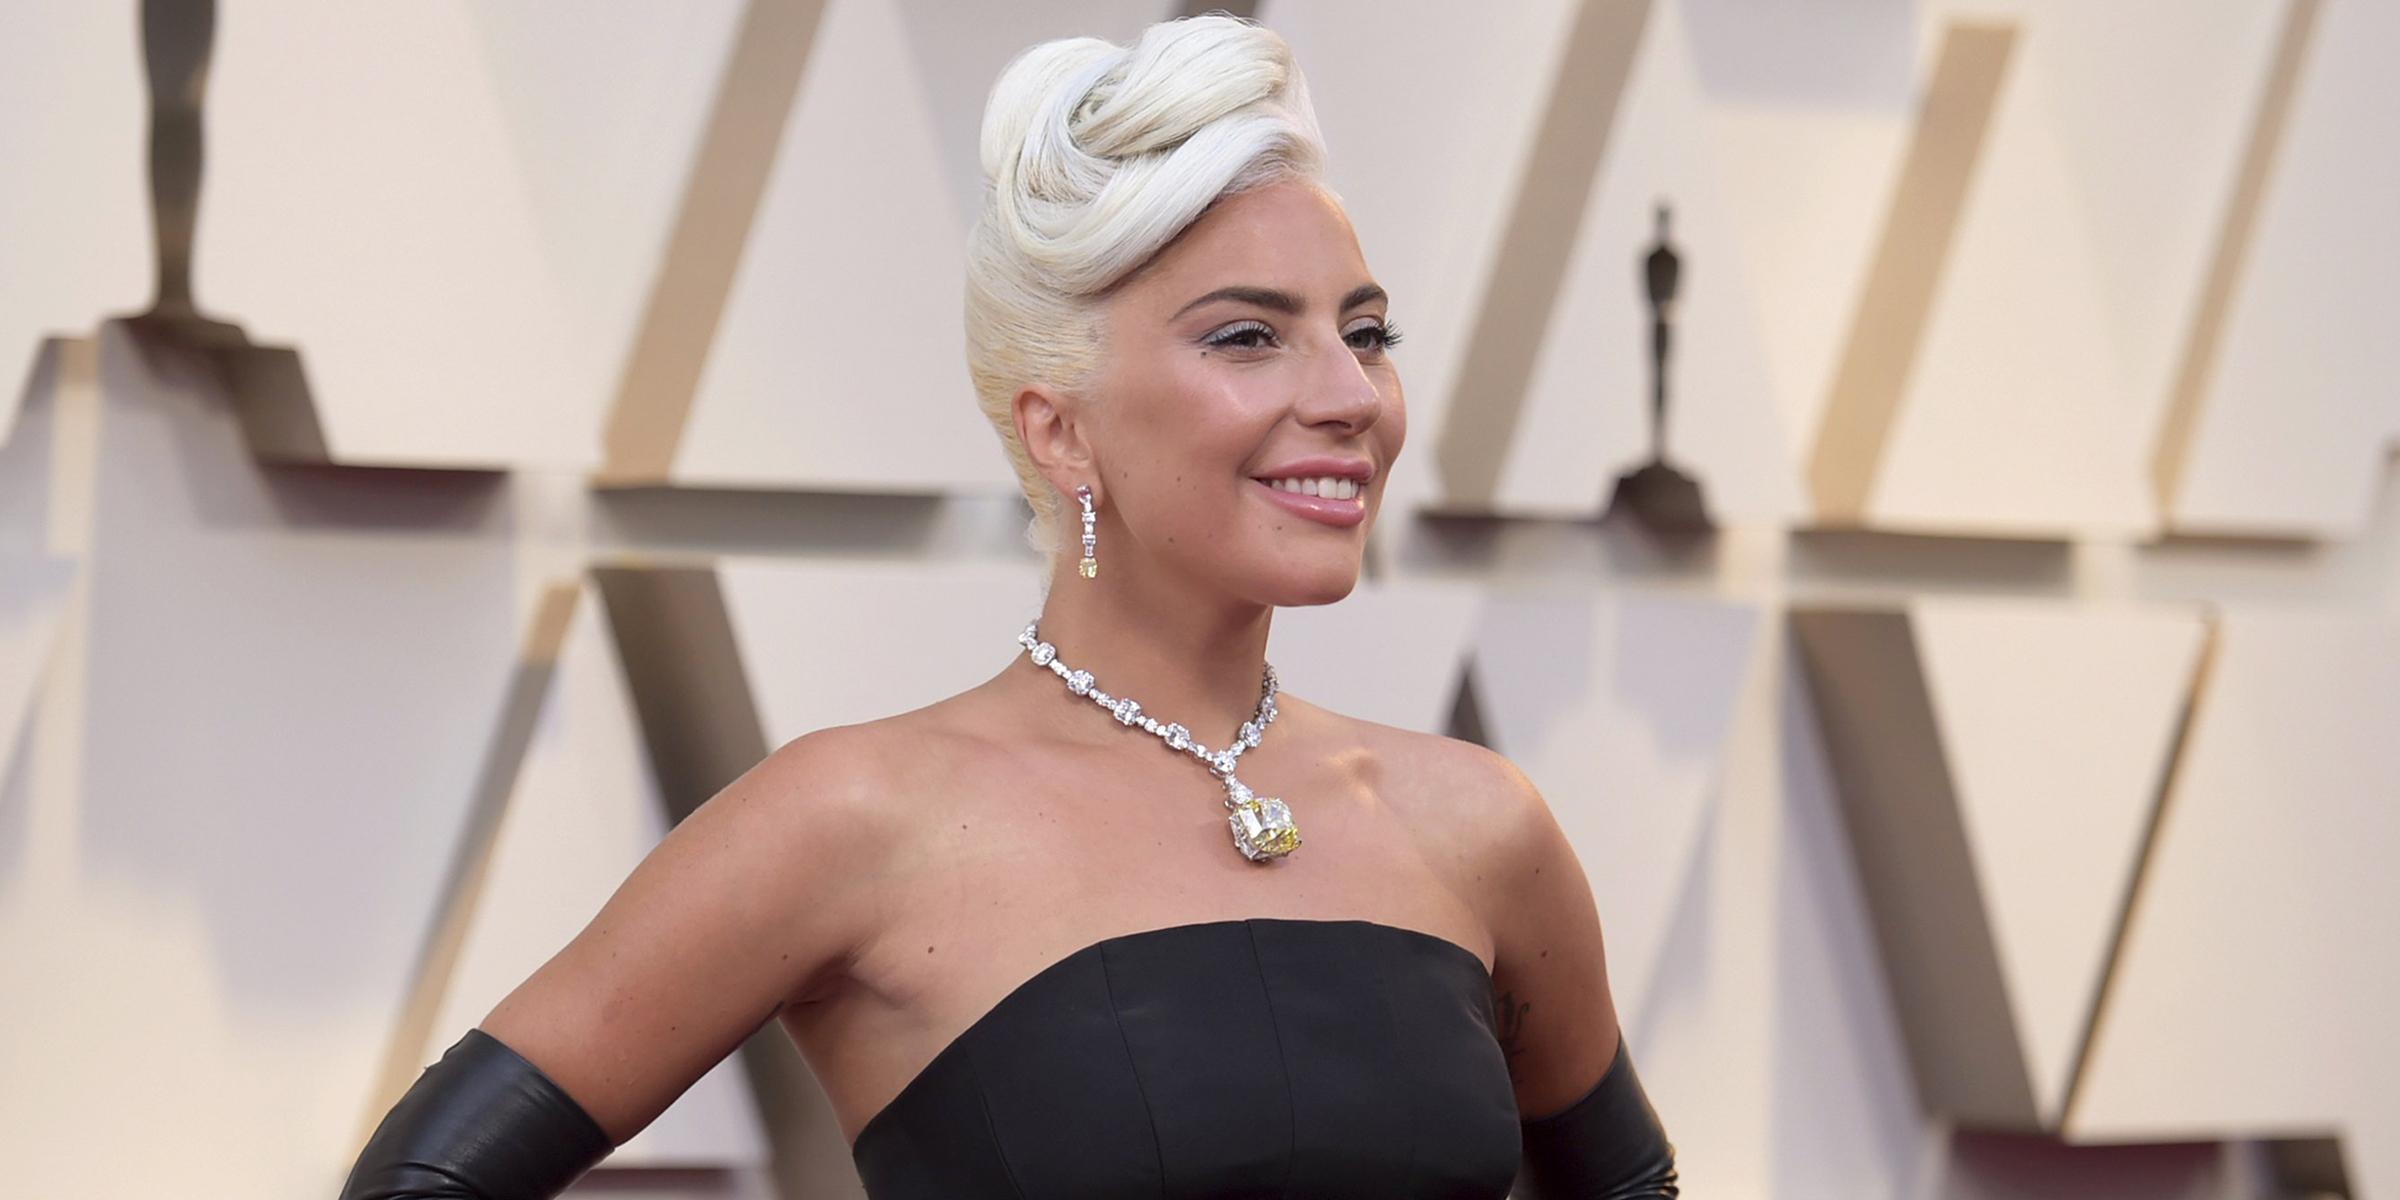 Oscar necklace